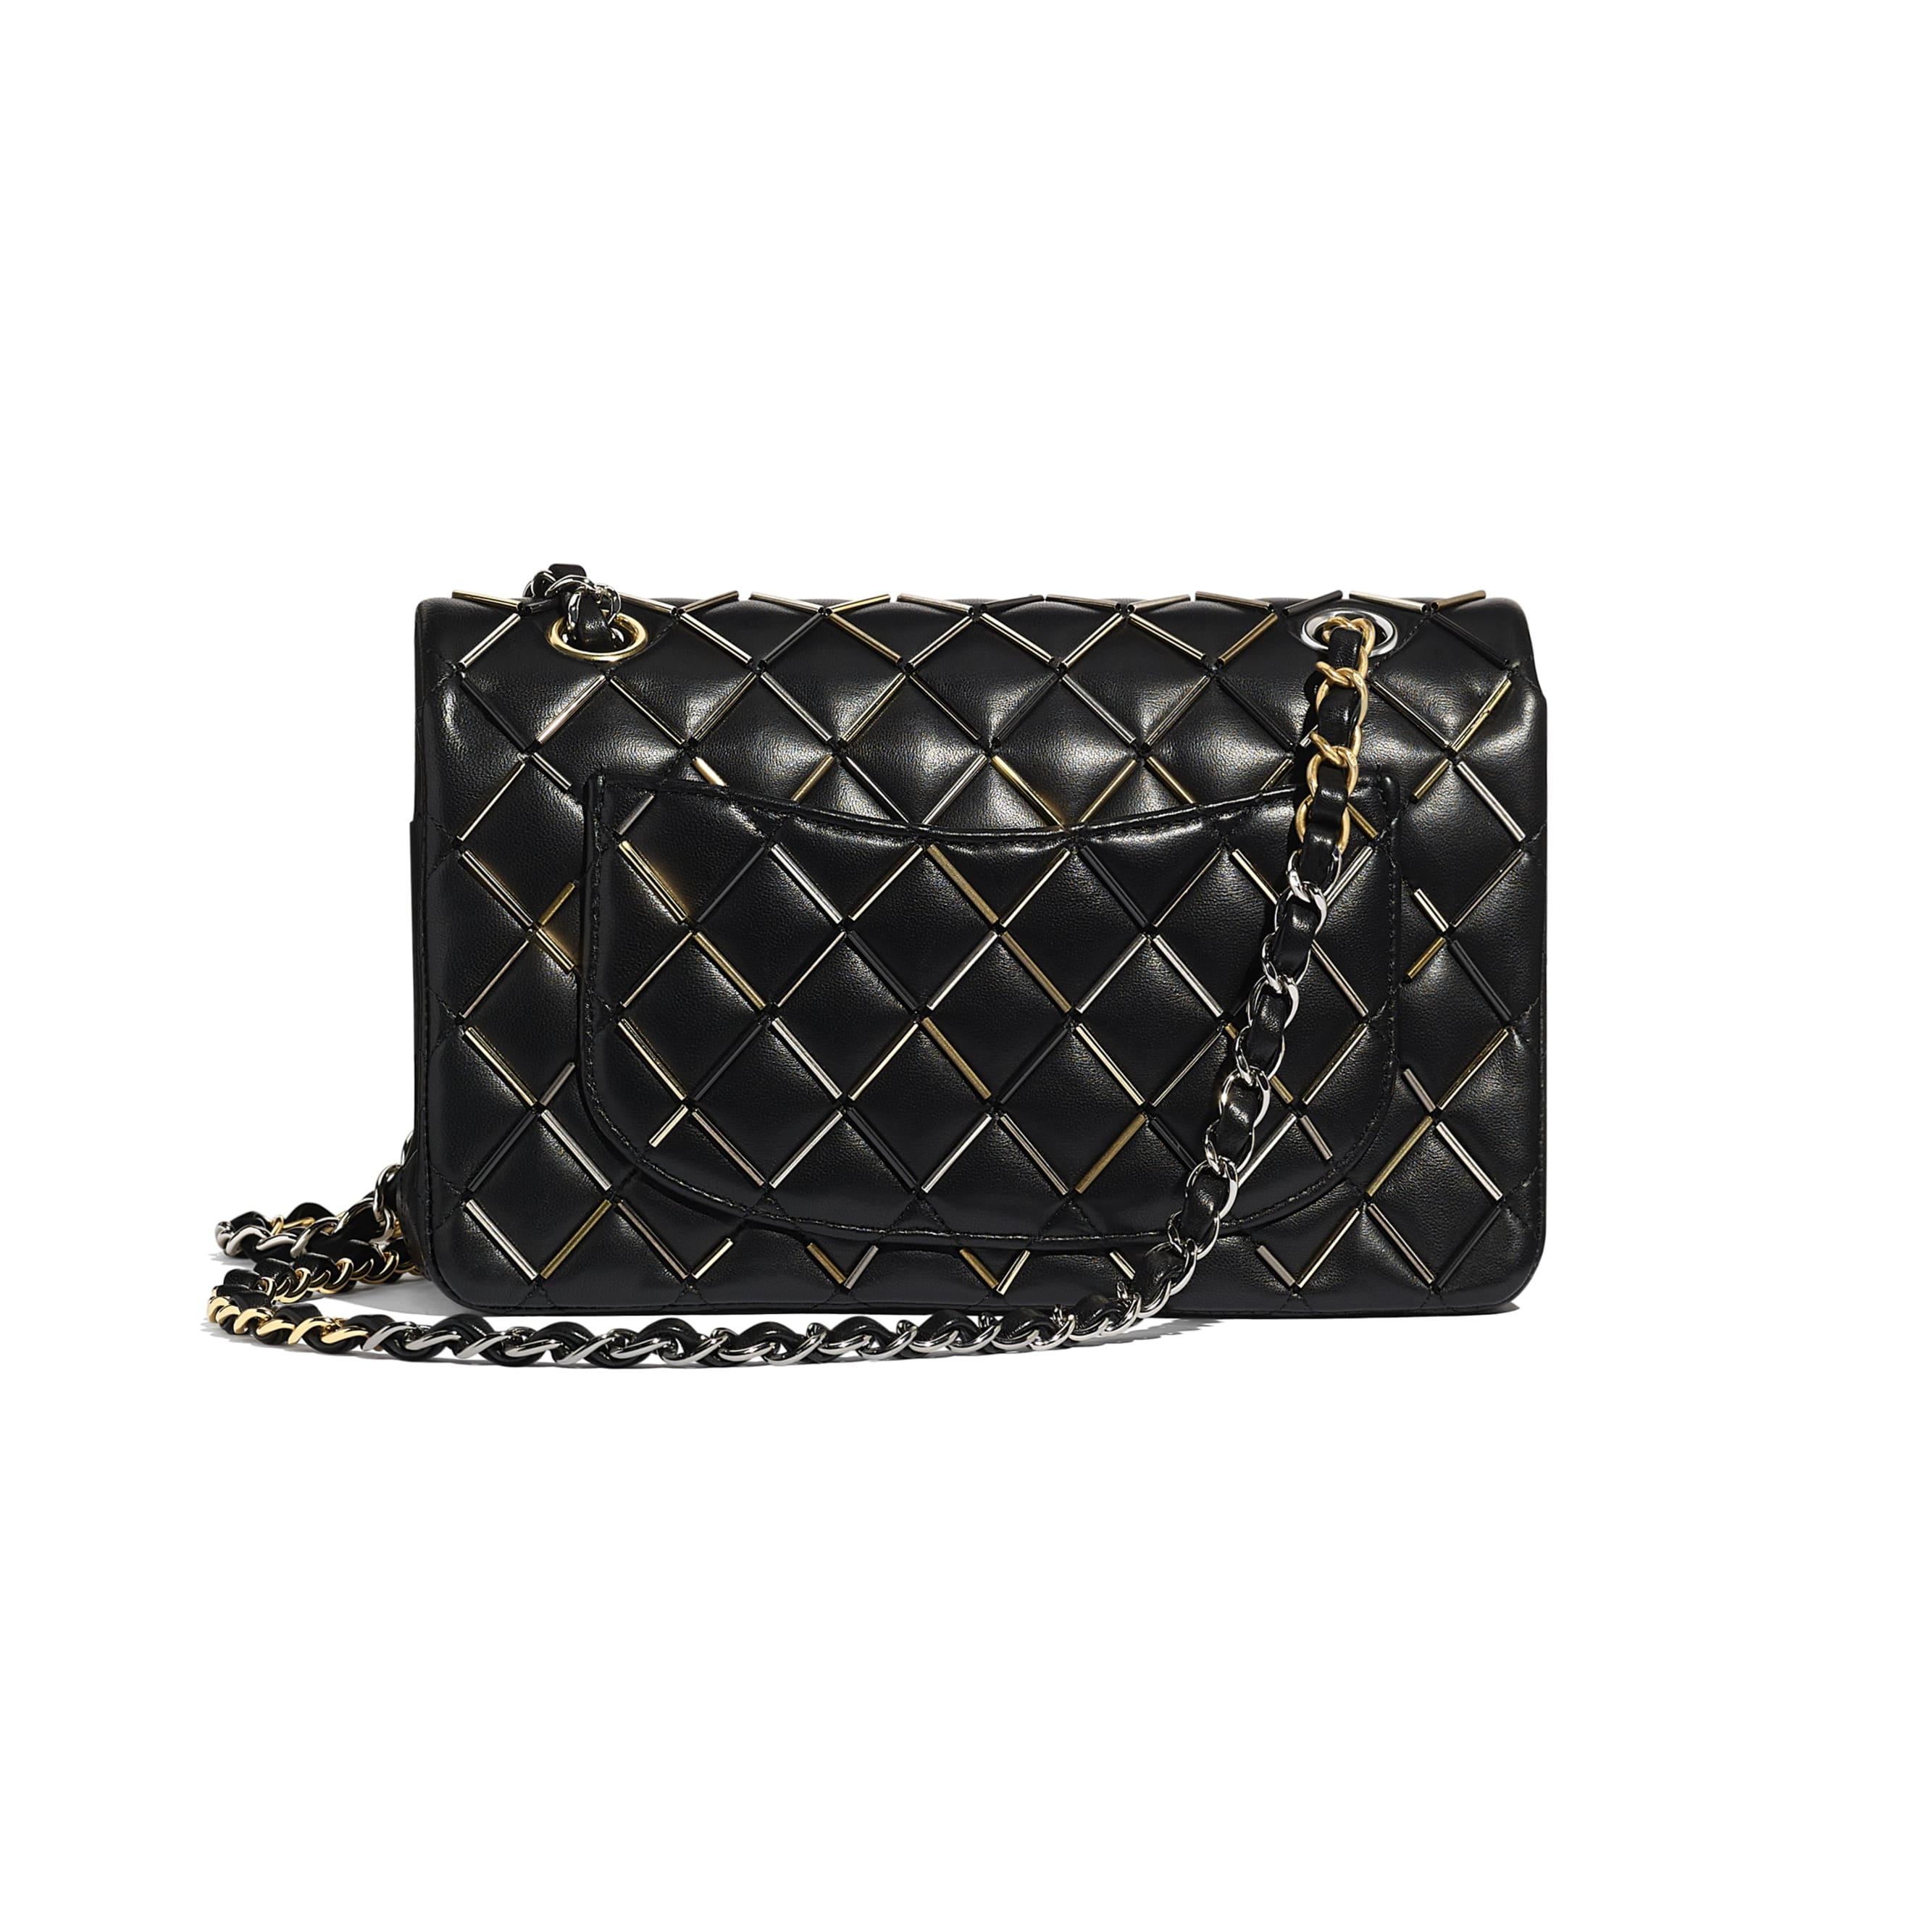 Classic Handbag - Black - Lambskin, Gold-Tone, Silver-Tone, Black & Ruthenium-Finish Metal  - CHANEL - Alternative view - see standard sized version